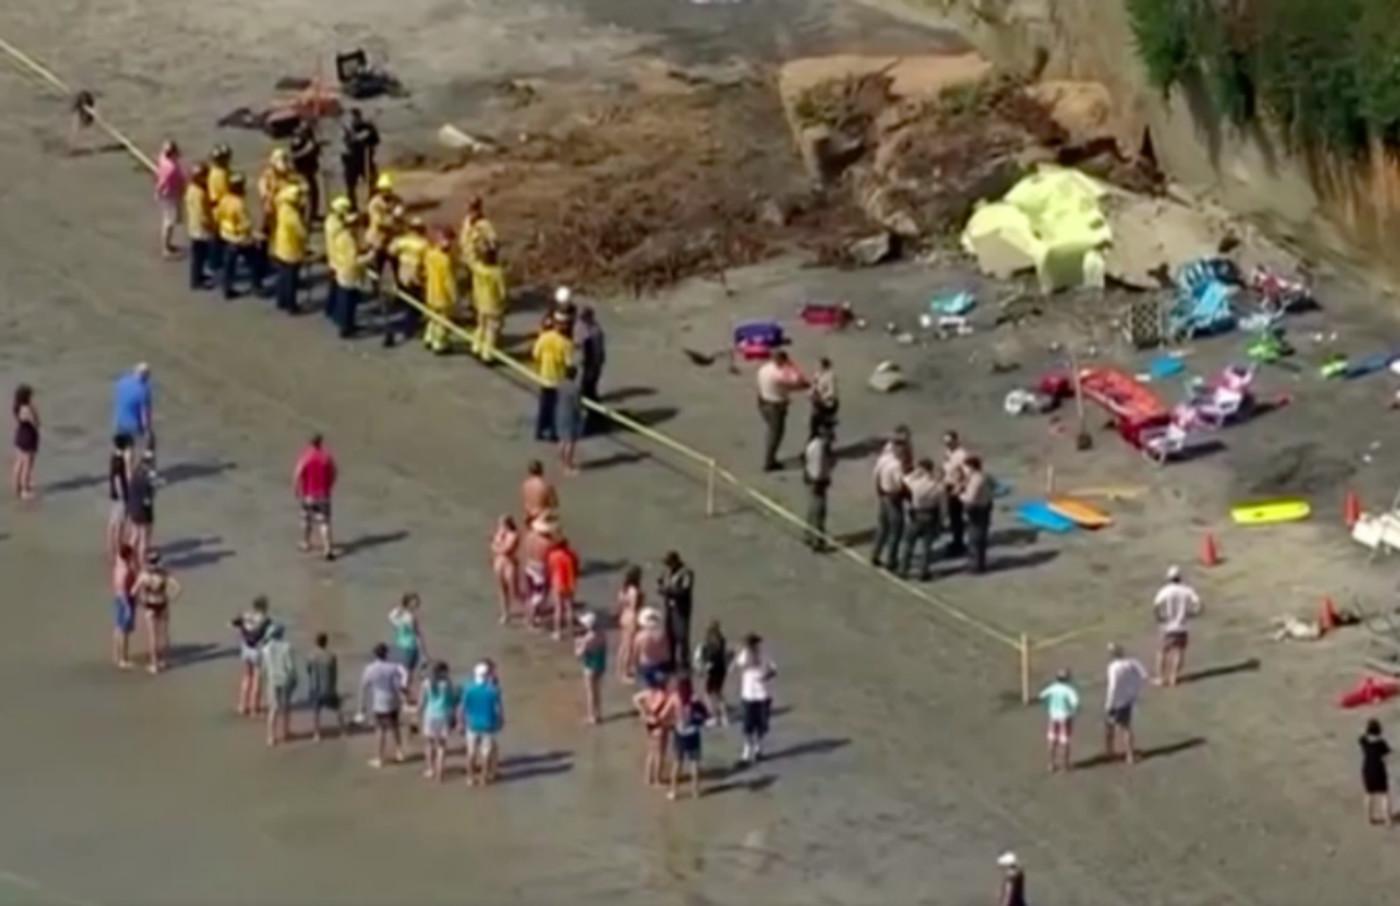 Cliff collapse in Encinitas, California